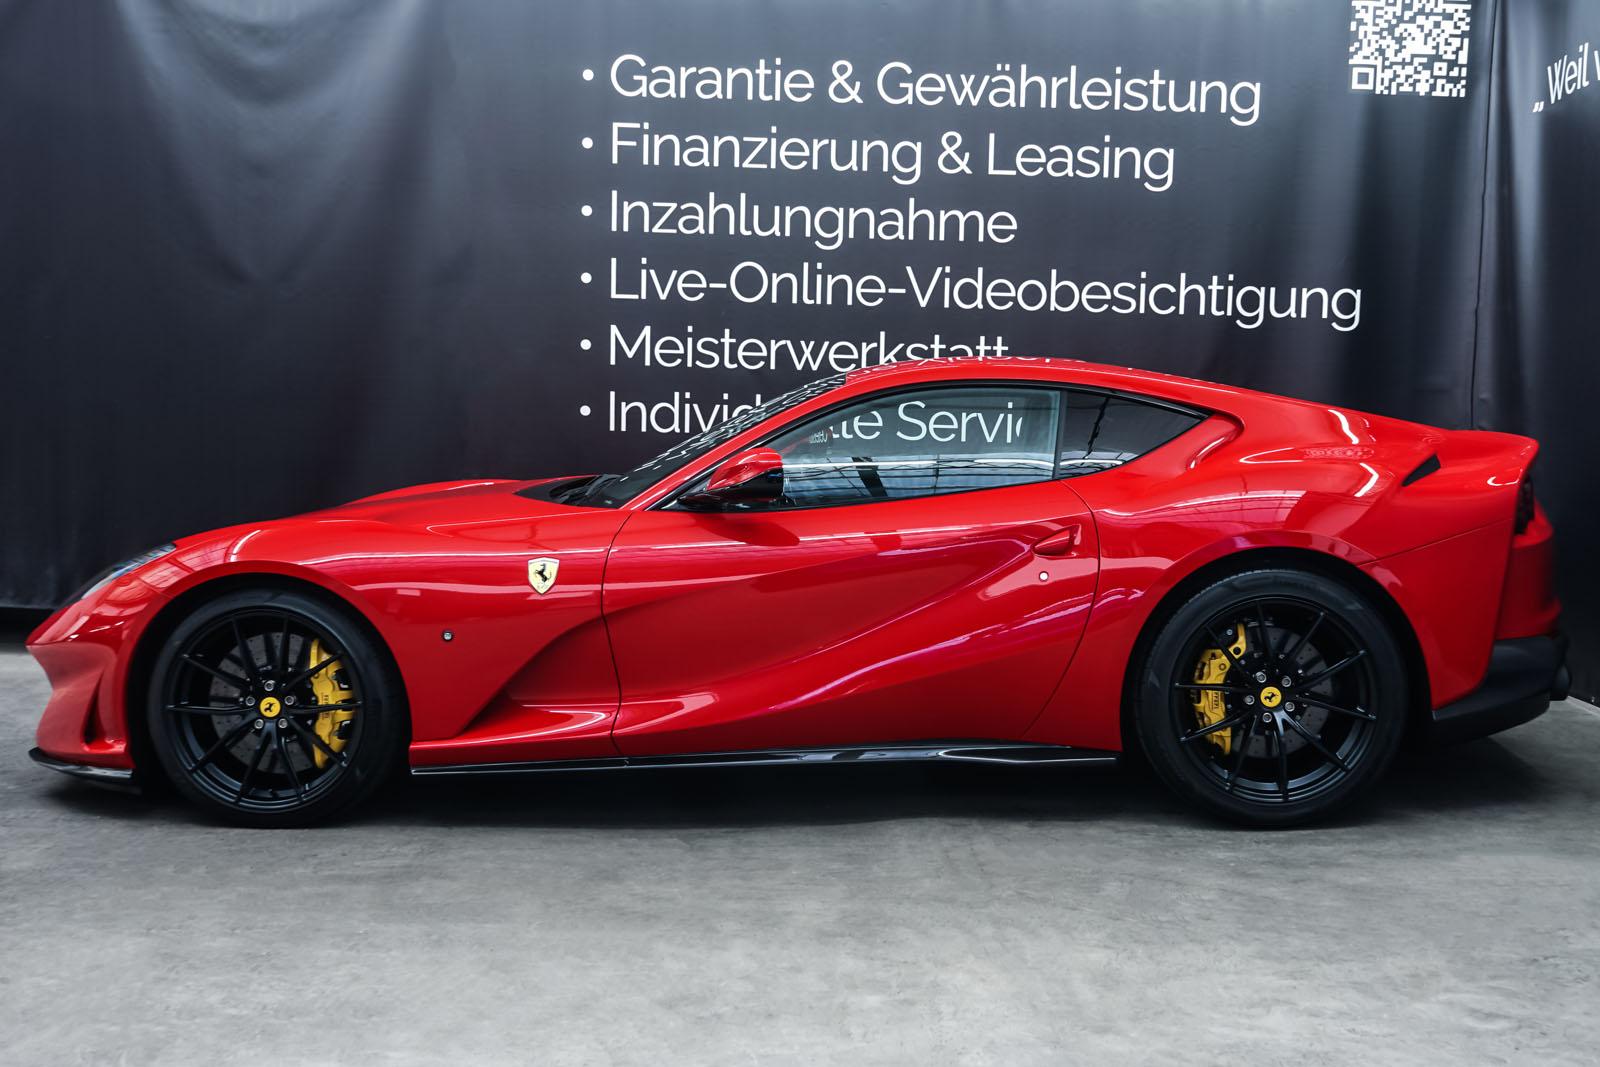 Ferrari_812_Superfast_Rot_Schwarz_FER-9922_5_w